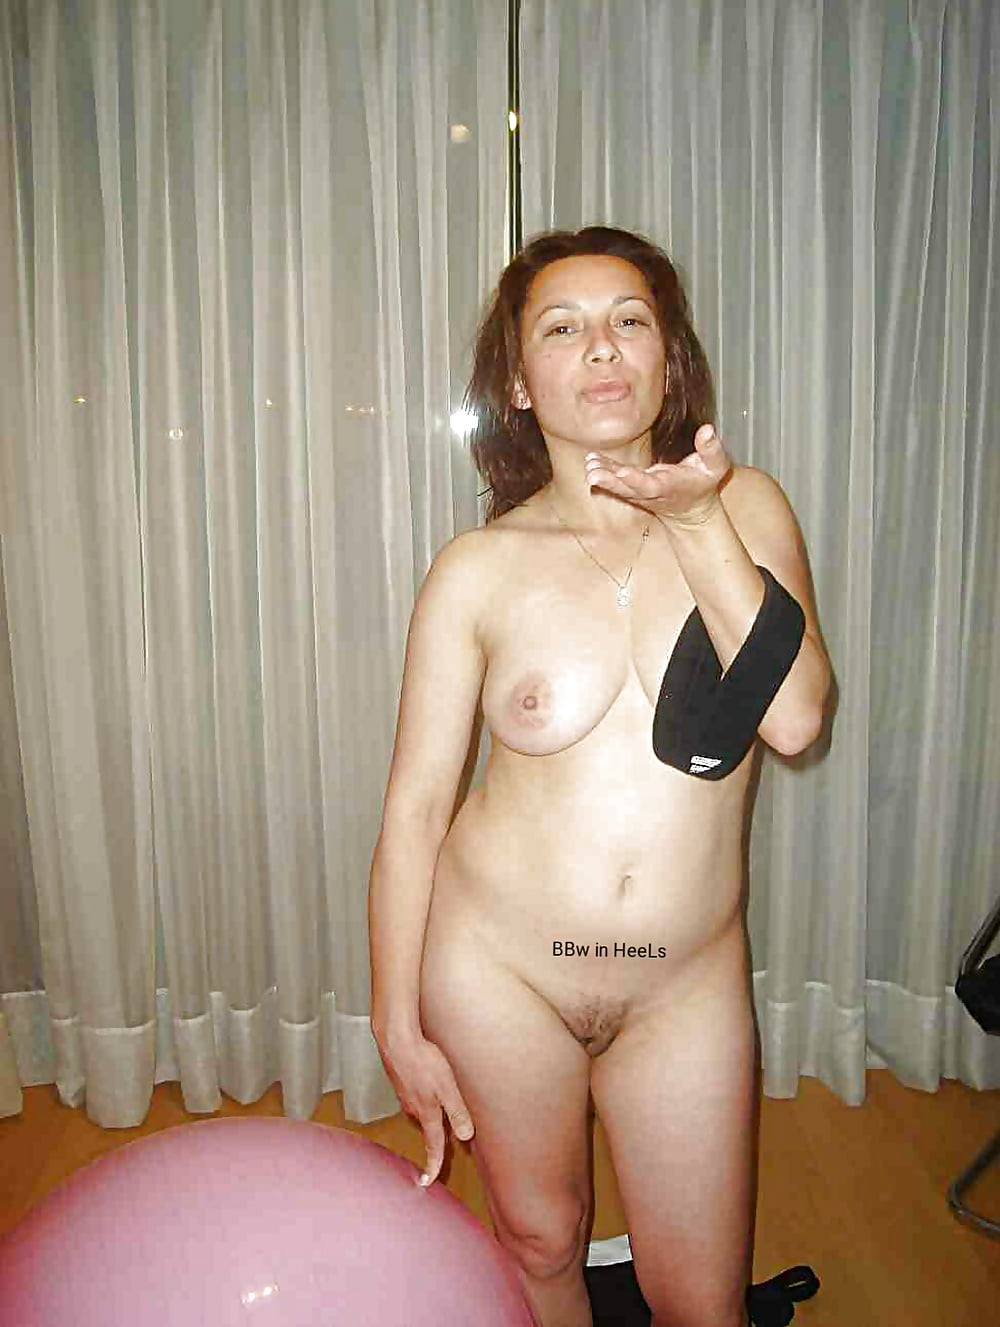 голые жены жены раз, что